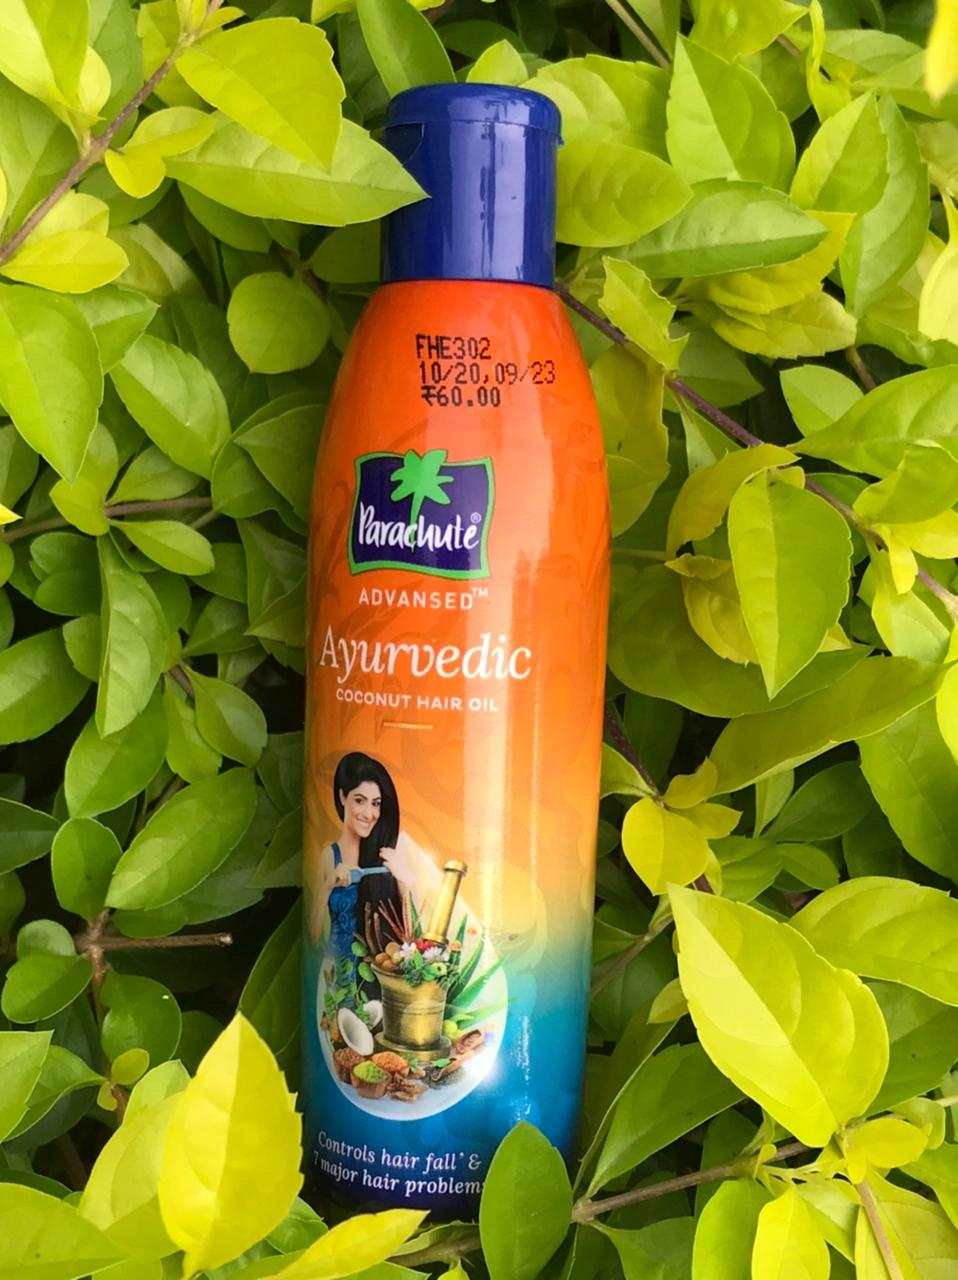 Parachute Advansed Ayurvedic Coconut Hair Oil-Hairfall treatment-By realbeauty